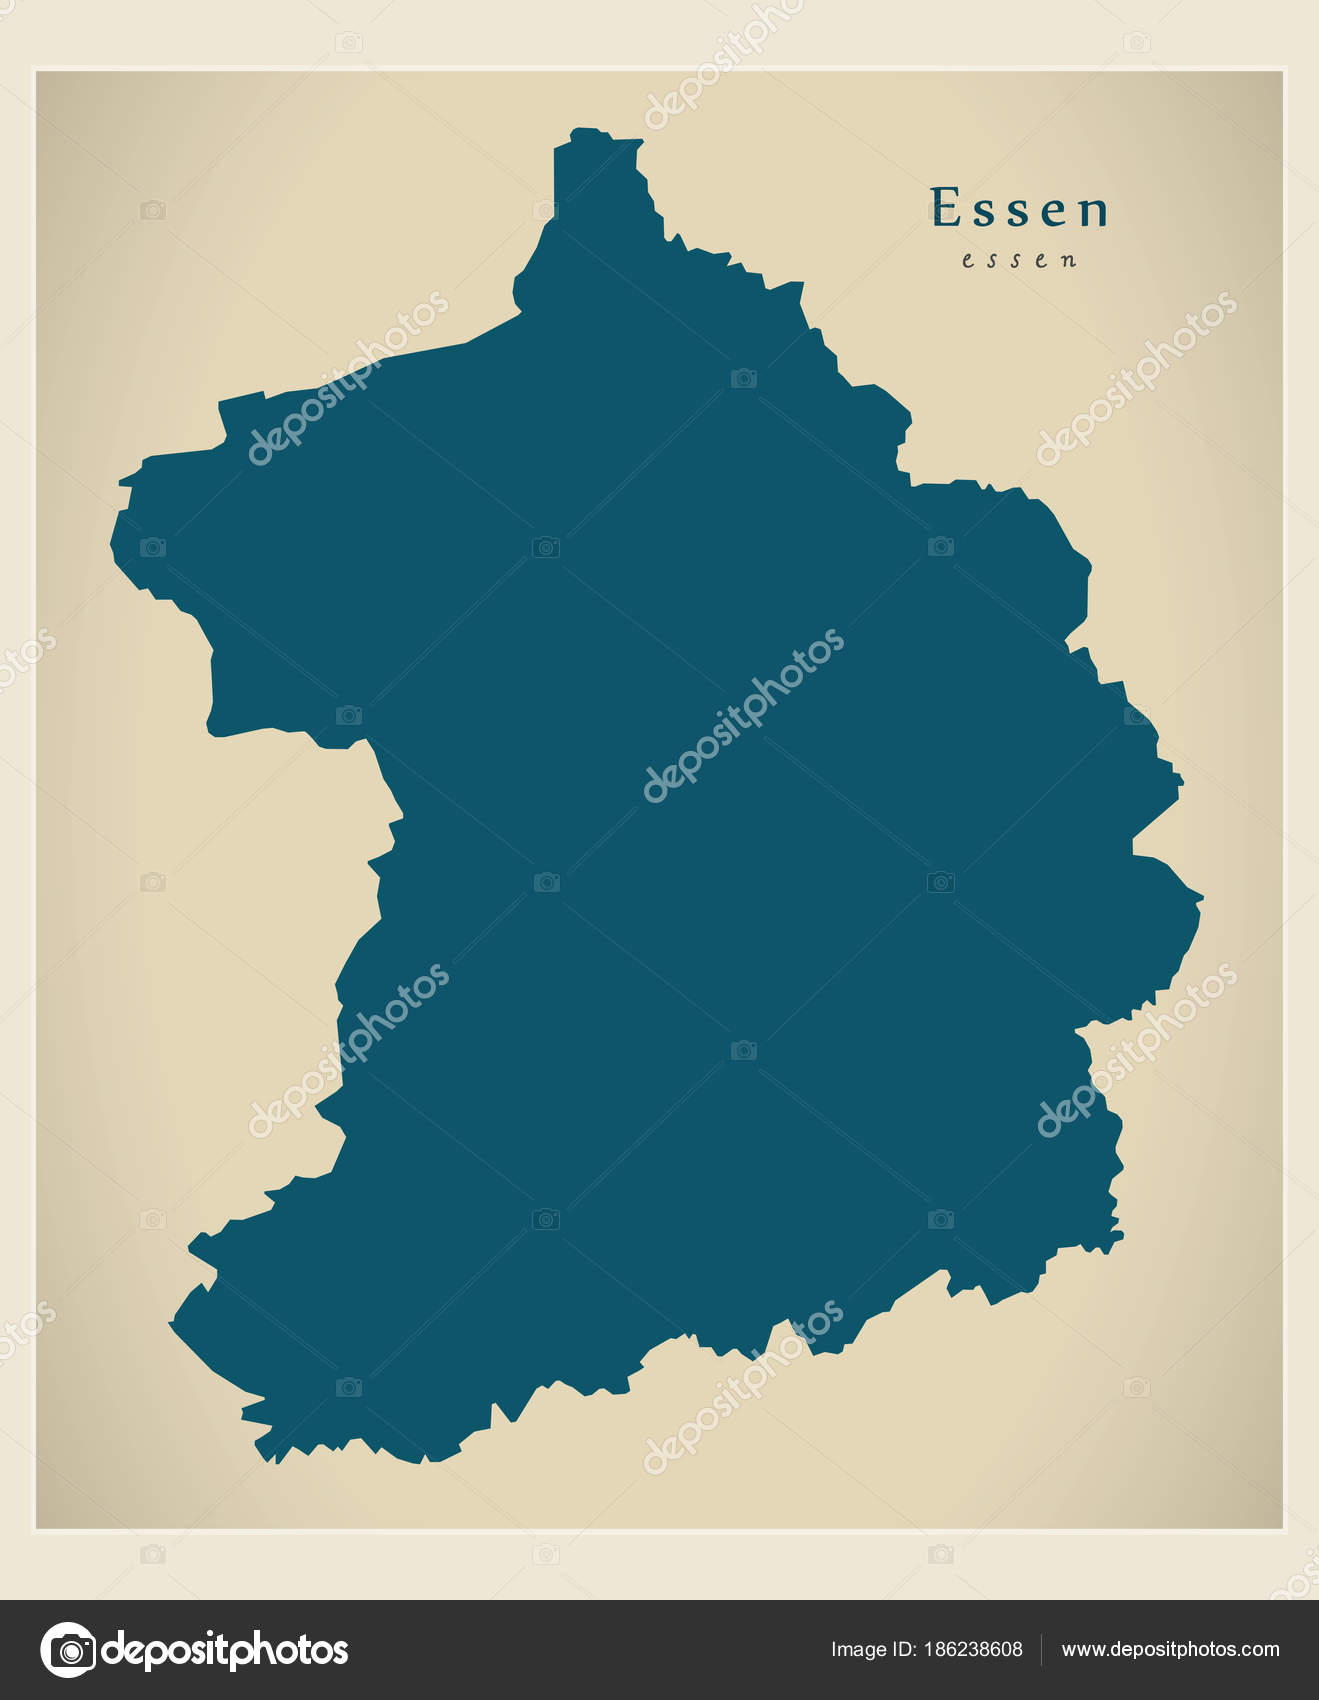 Modern Map Essen city of Germany DE Stock Vector ingomenhard